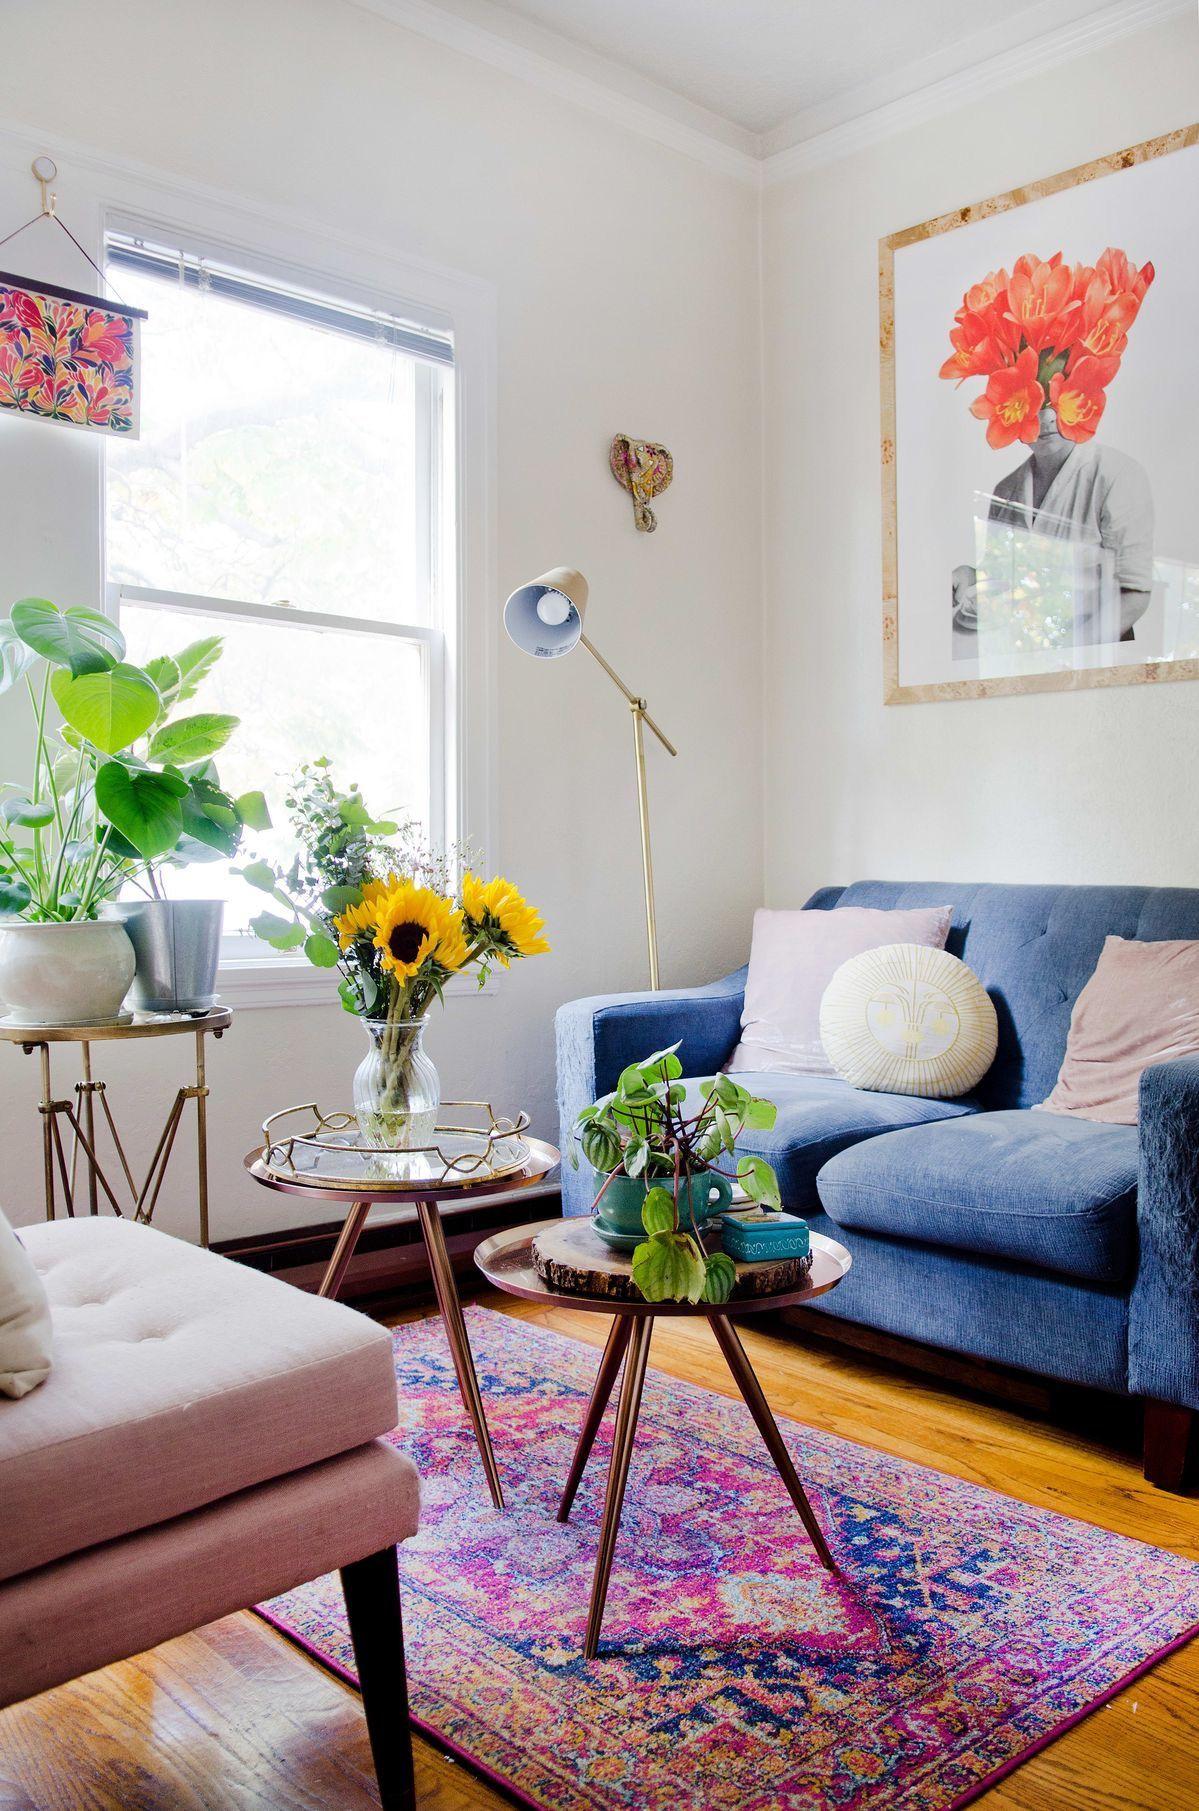 Living room decor ideas, remodeling inspiration, interior ...